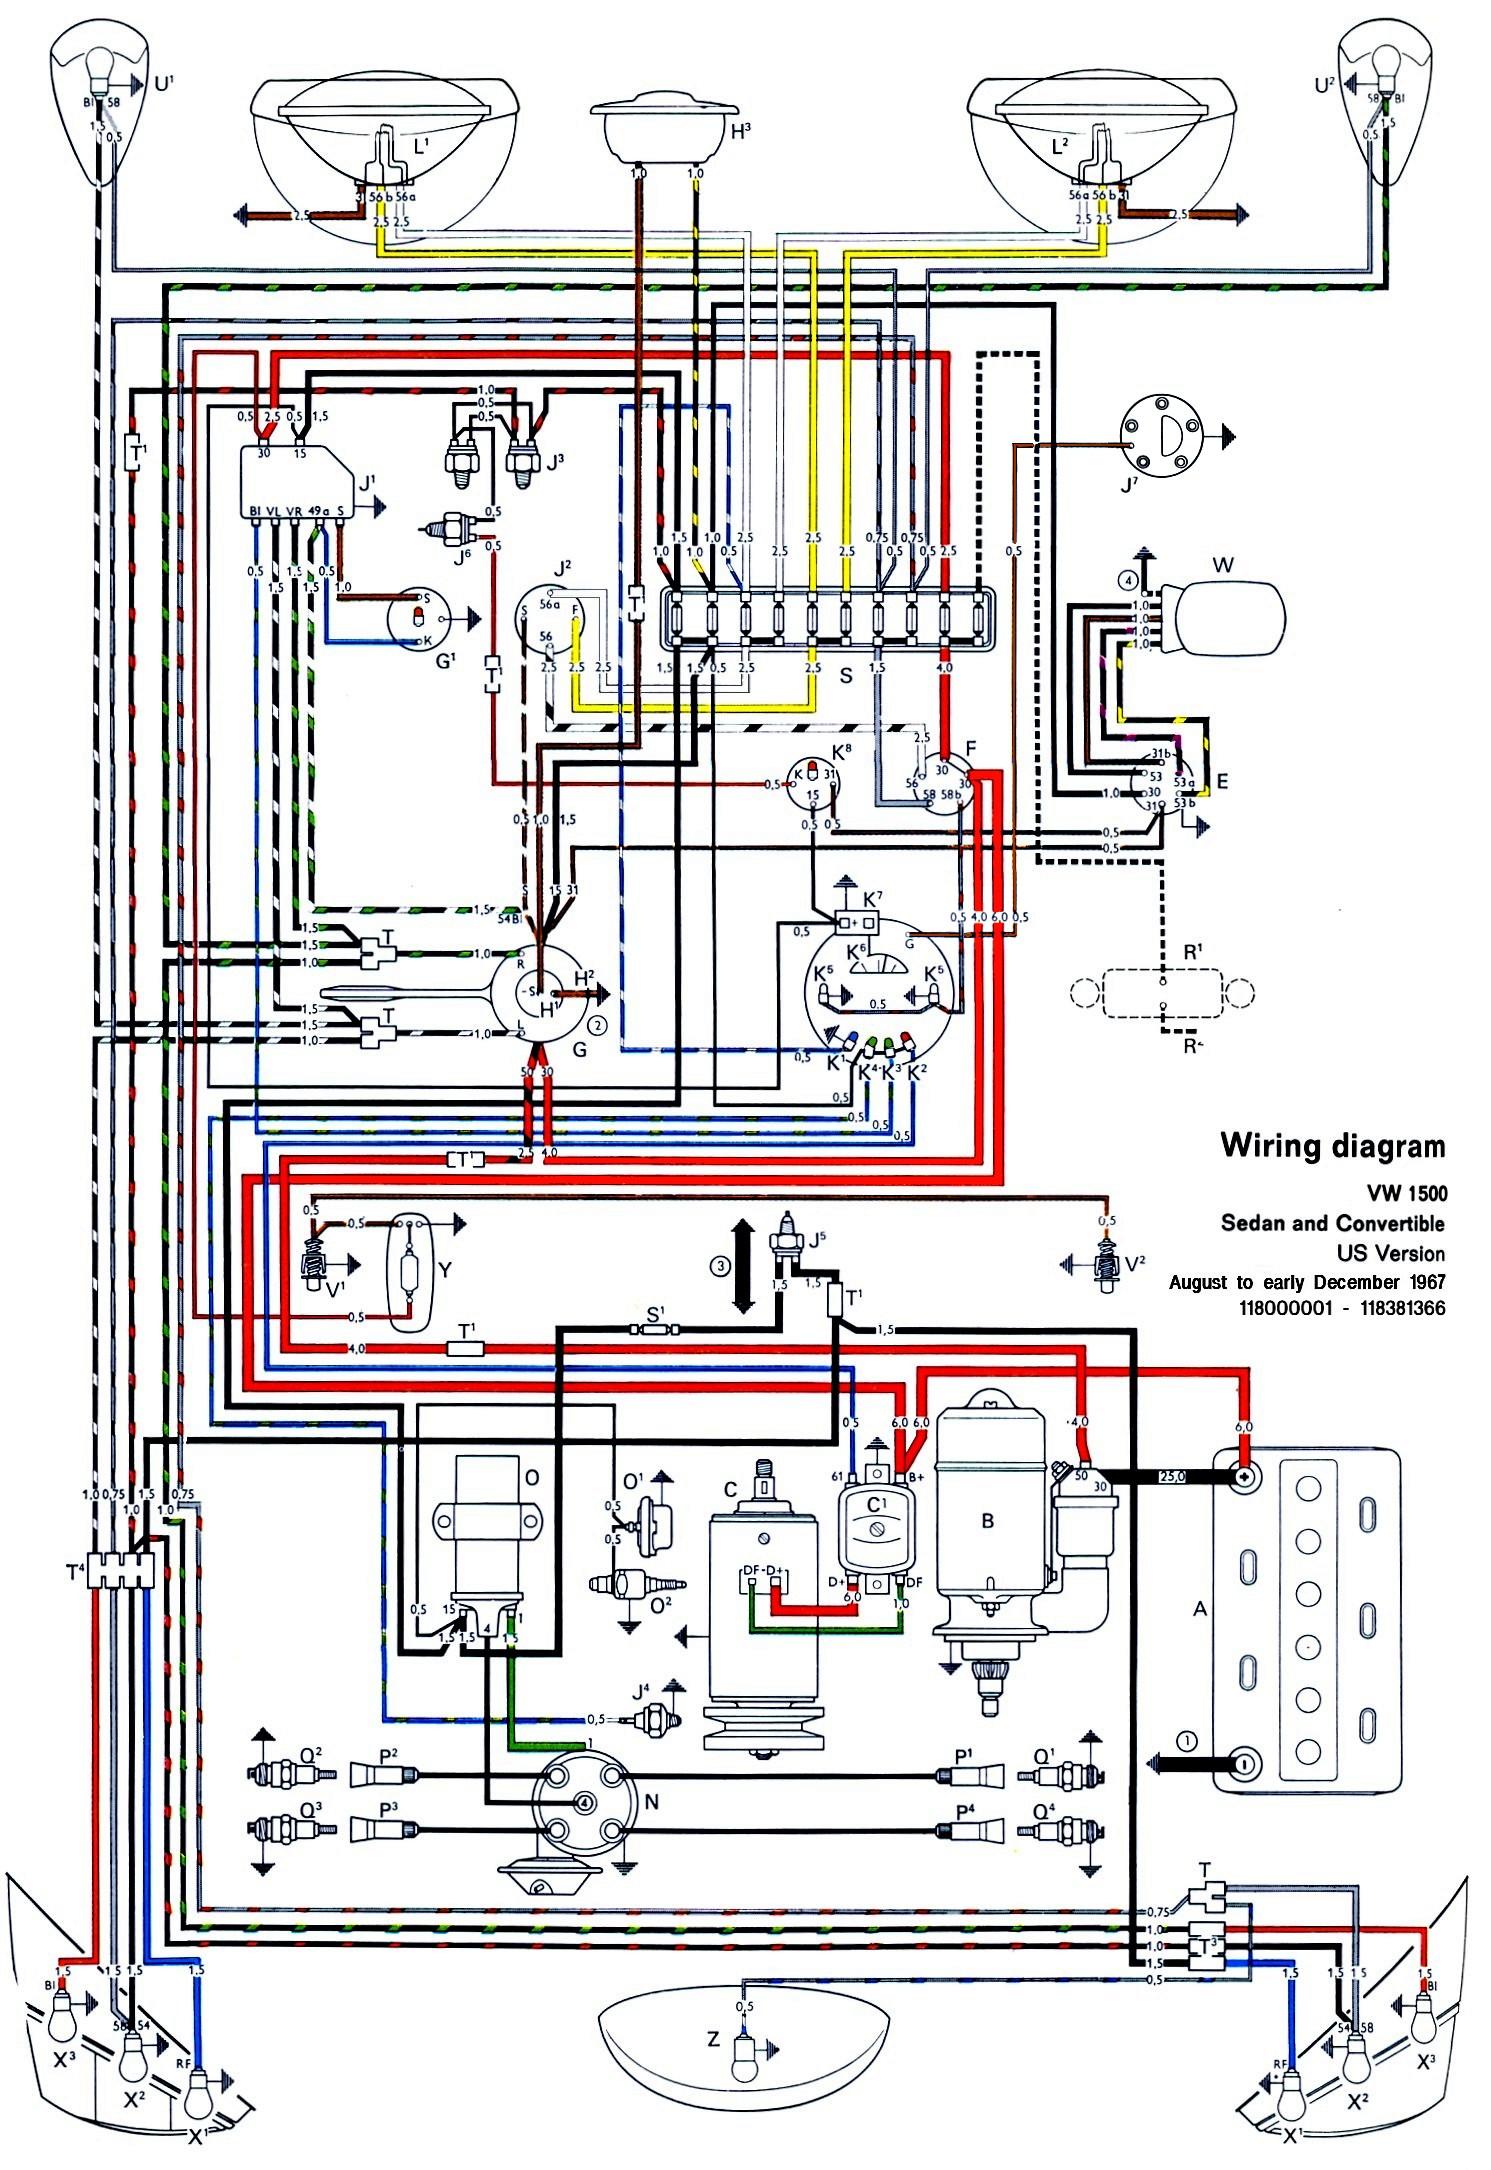 Alternator Wiring Harness Upgrade Kit Vanagon : Vw vanagon trailer wiring kit hardware elsavadorla